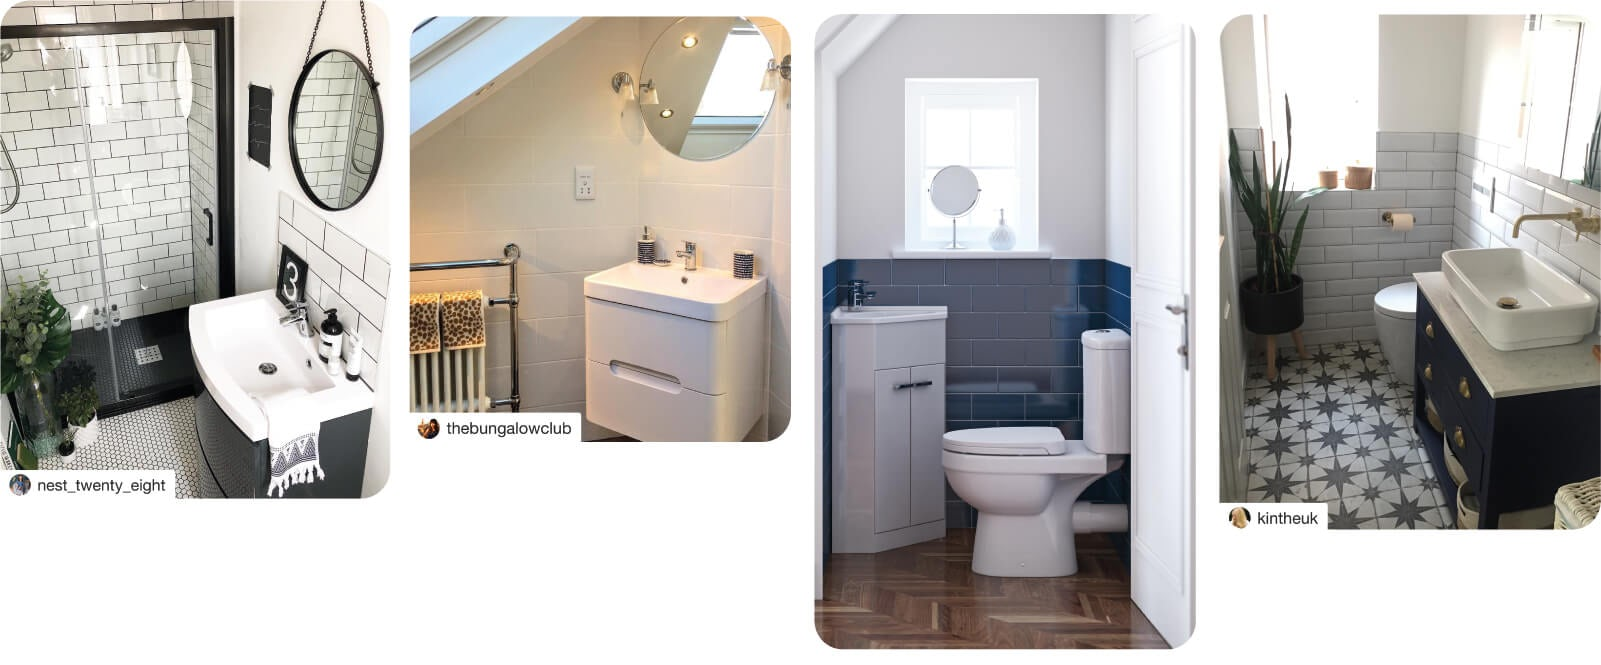 Small bathroom inspiration from VictoriaPlum.com customers